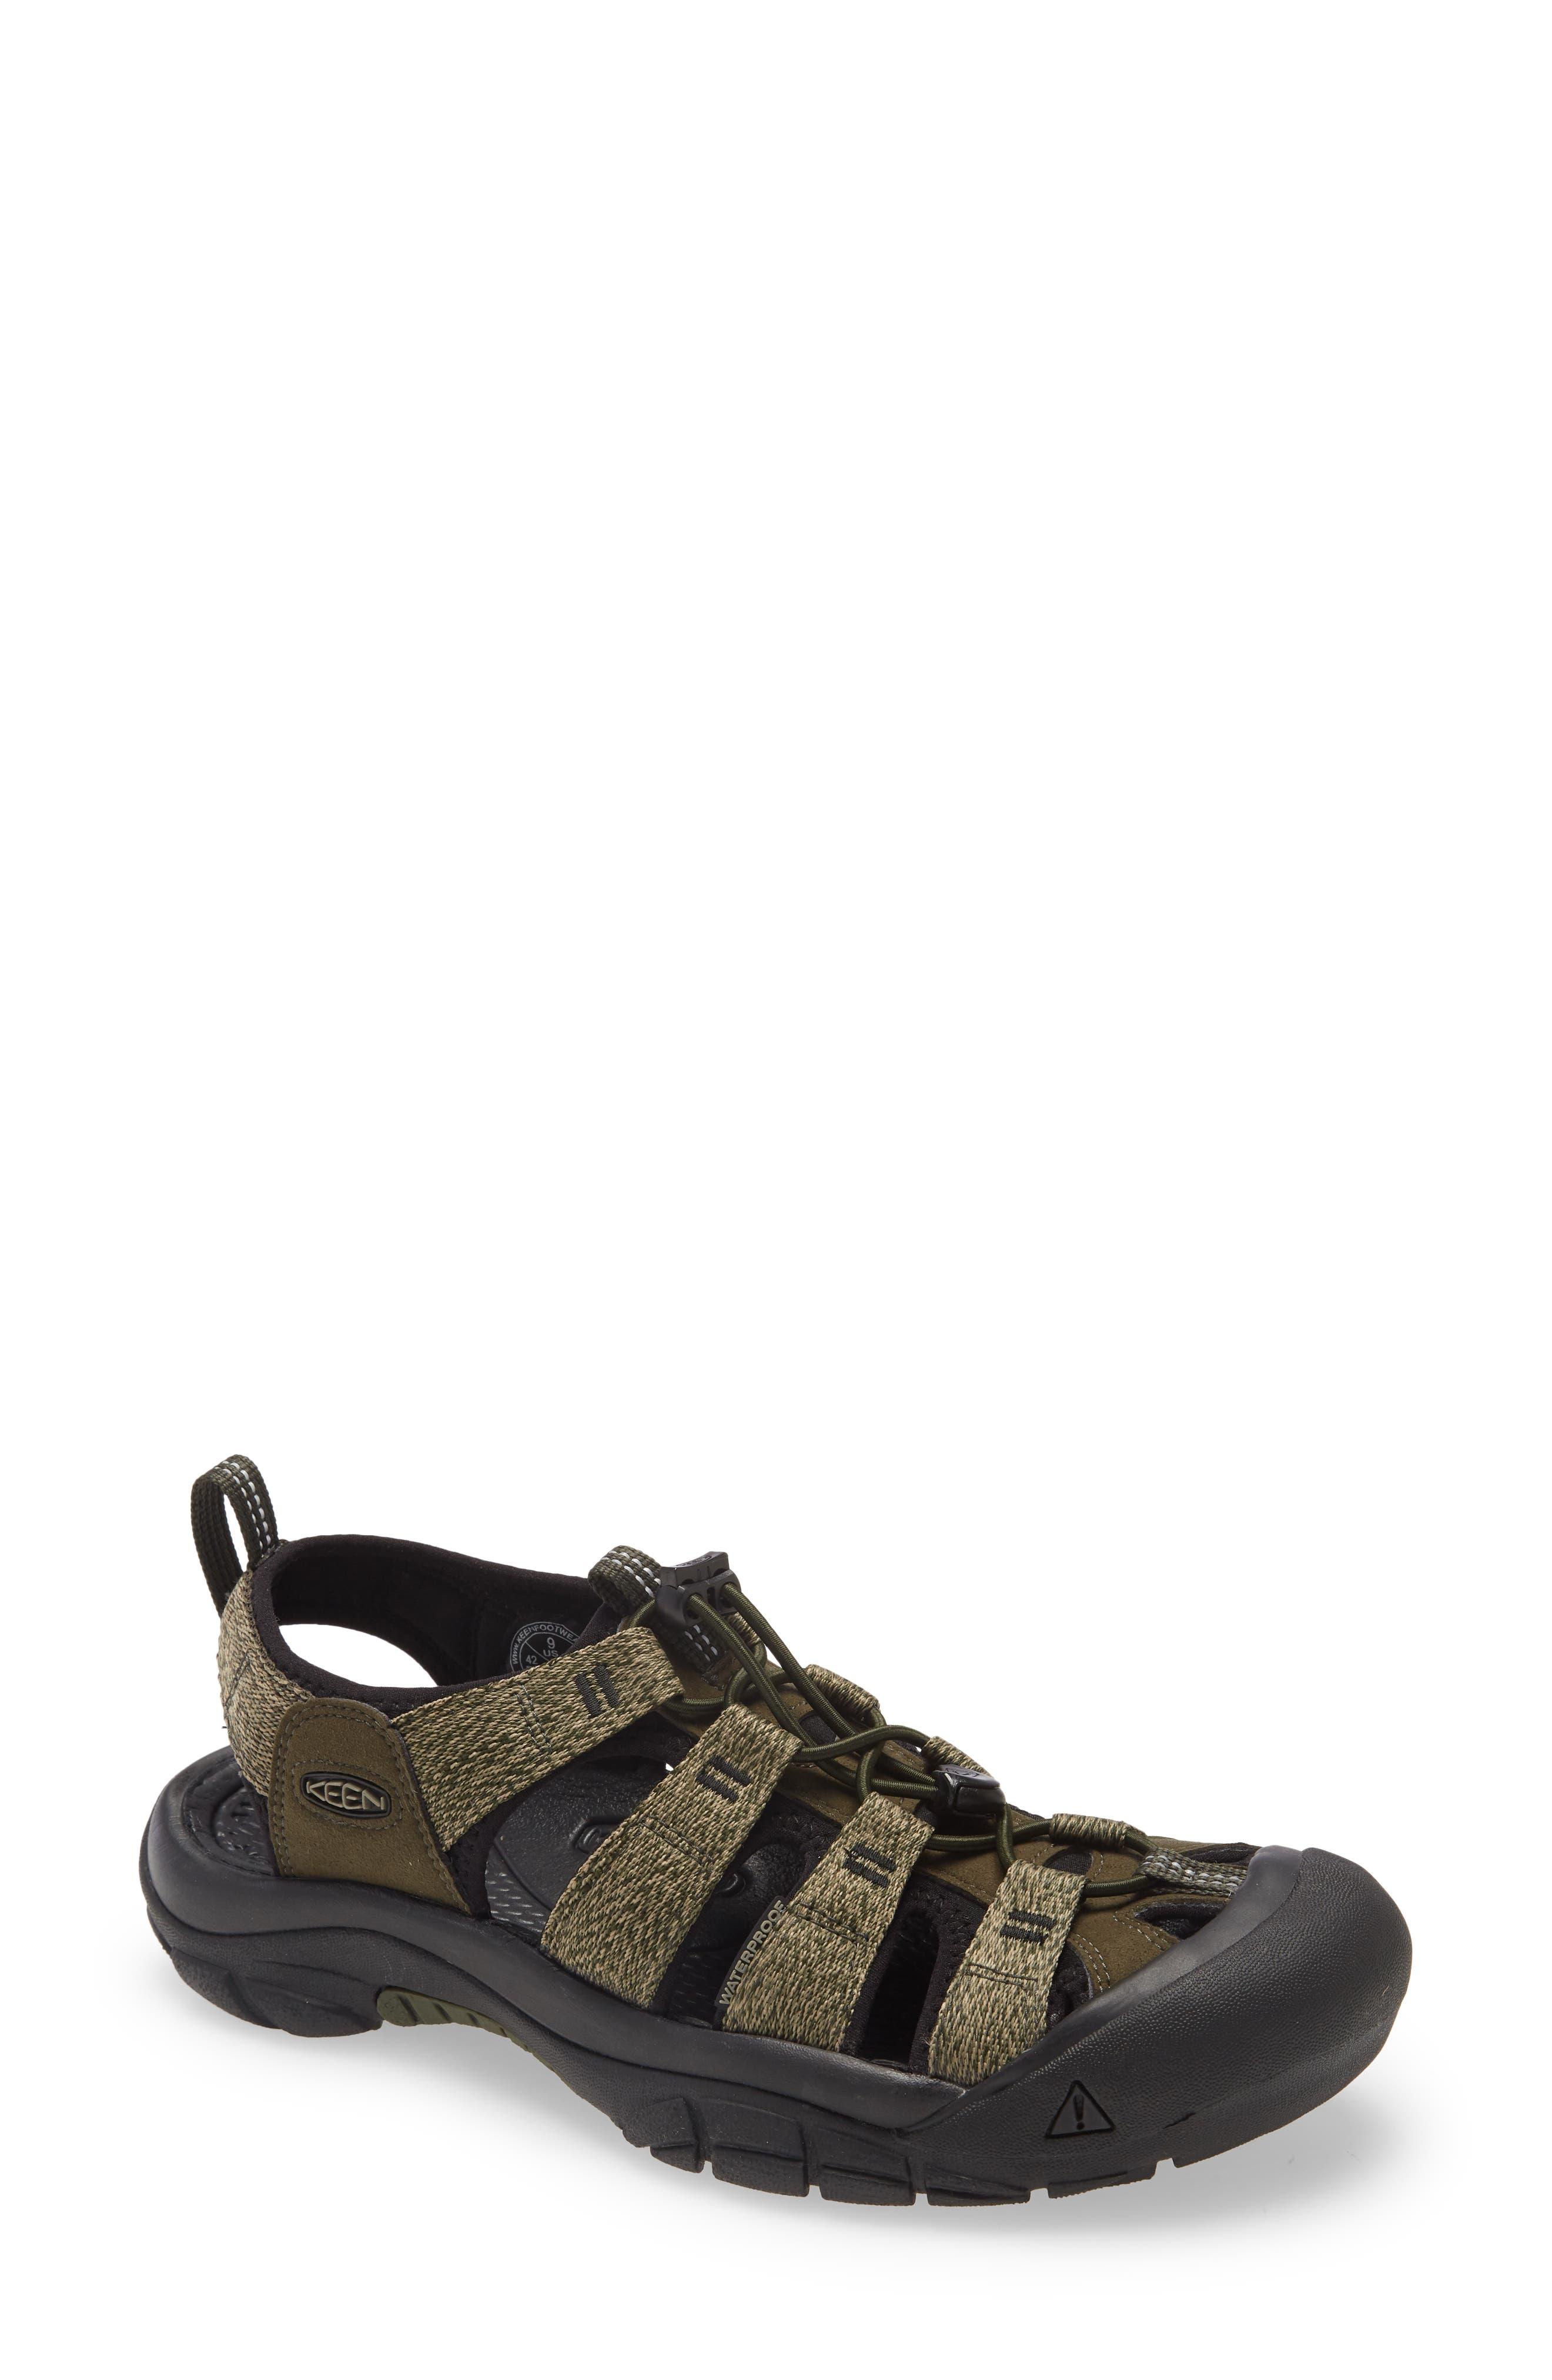 'Newport H2' Sandal